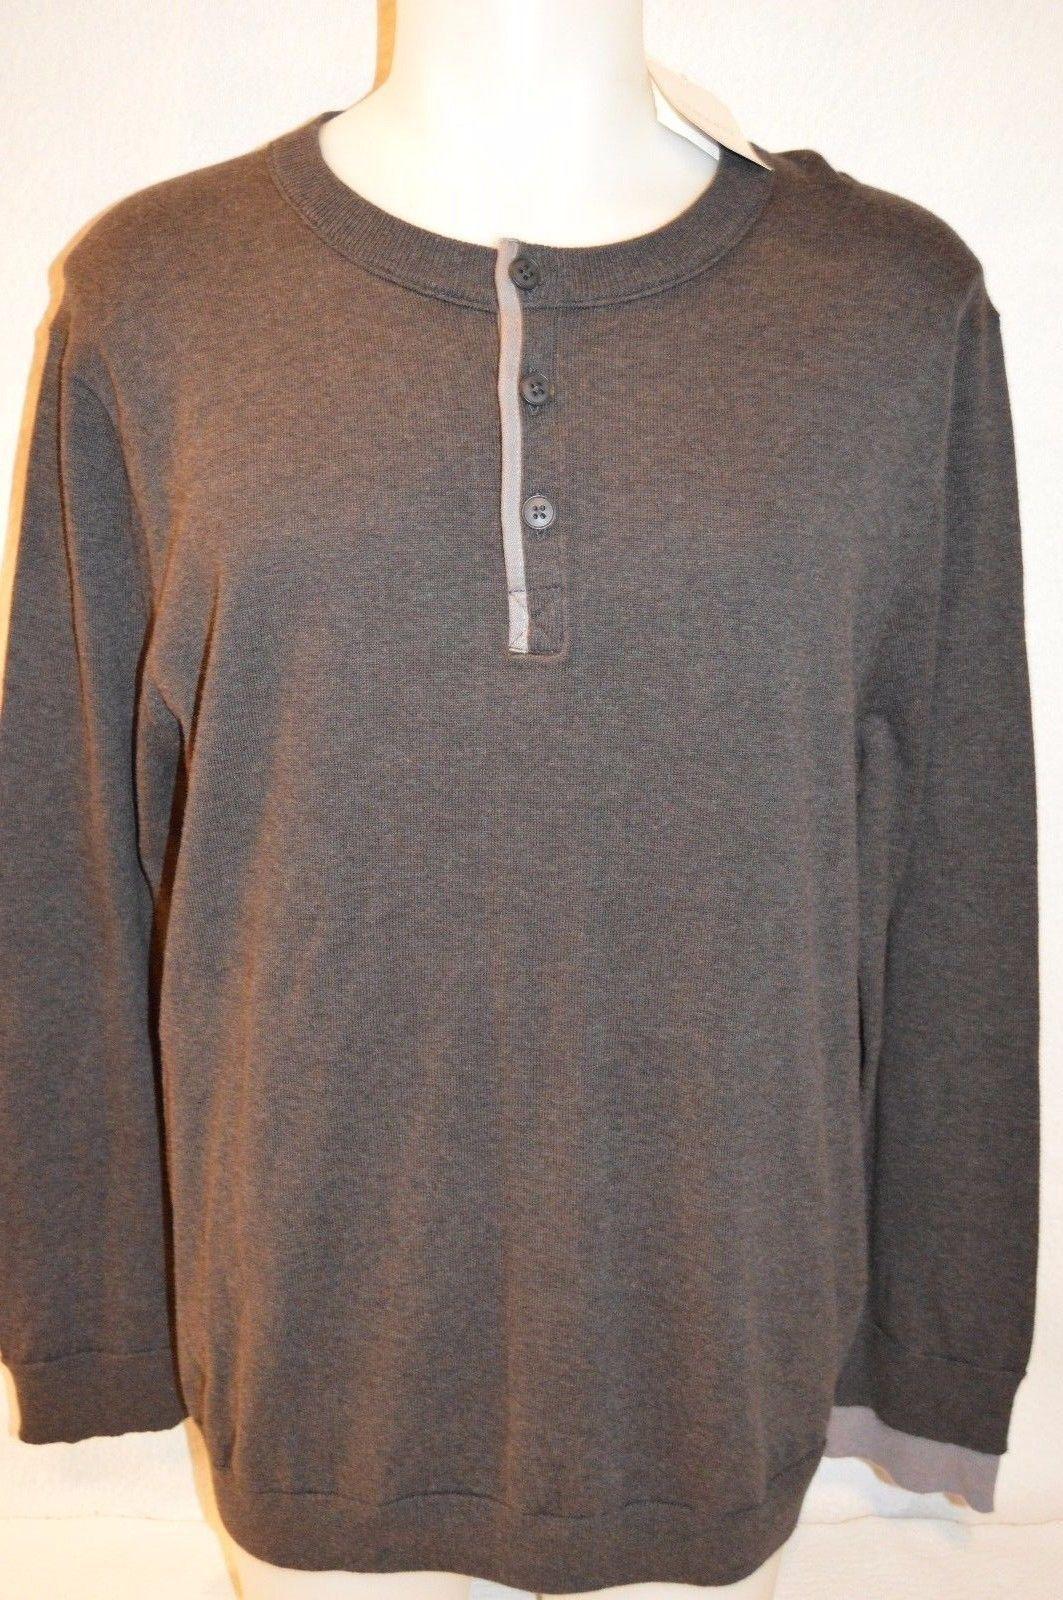 NWT INHABIT 3322 Men's Medium Charcoal purplec Cotton Henley Sweater